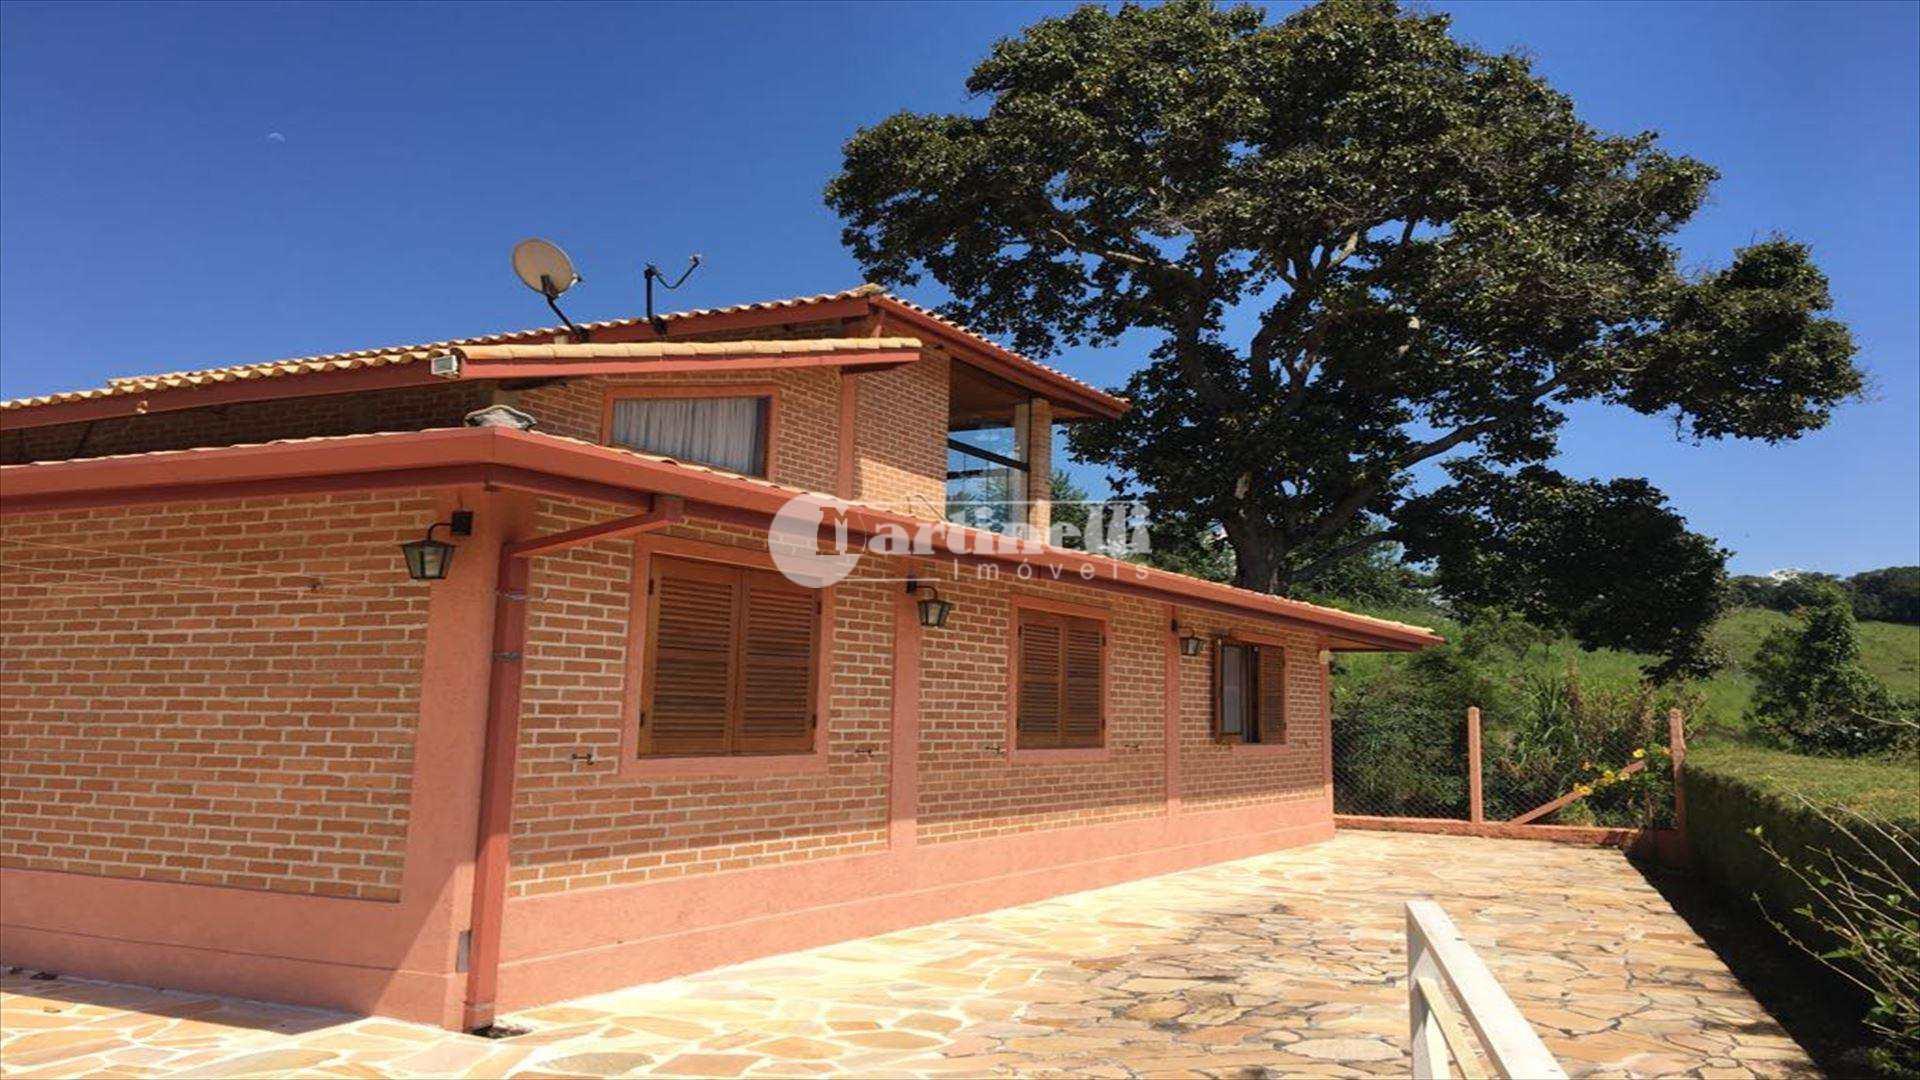 Casa de Condomínio com 4 dorms, Zona Rural, Santo Antônio do Pinhal - R$ 2.35 mi, Cod: 551